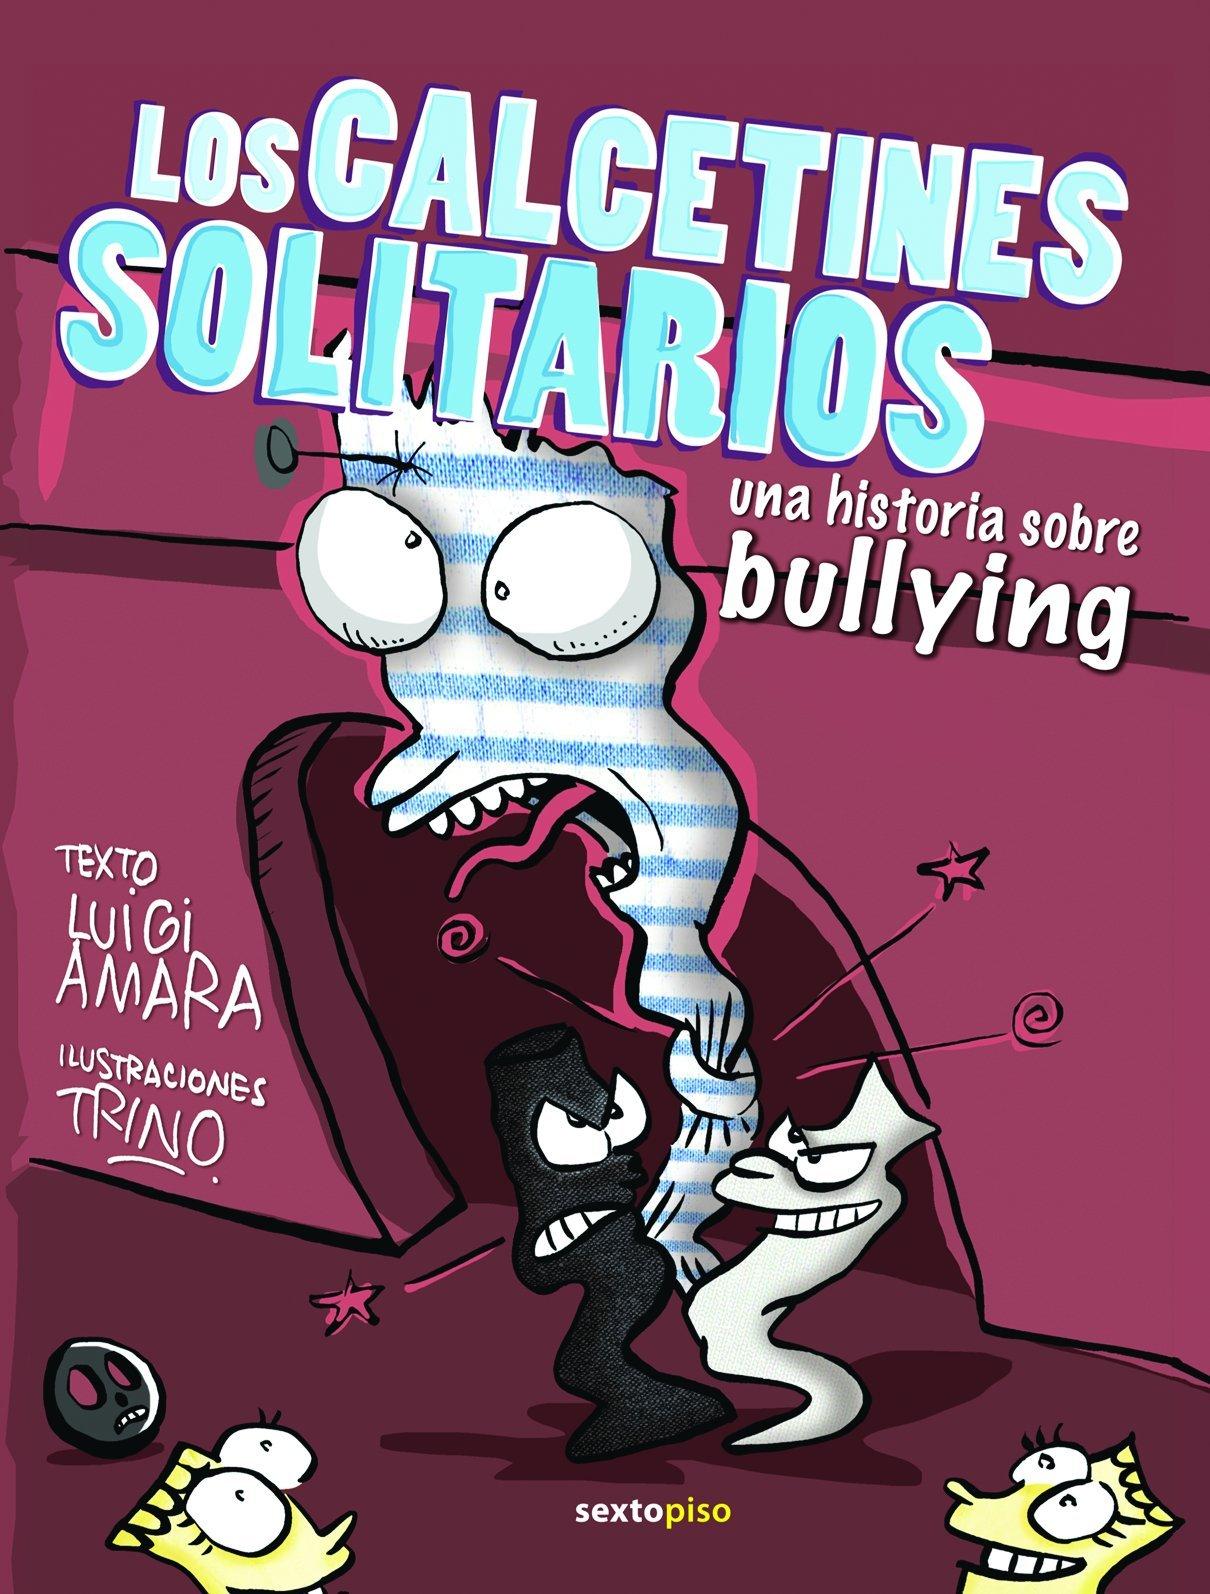 Los Calcetines Solitarios: Una Historia Sobre Bullying: AMARA LUIGI / TRINO: 9786077781141: Amazon.com: Books